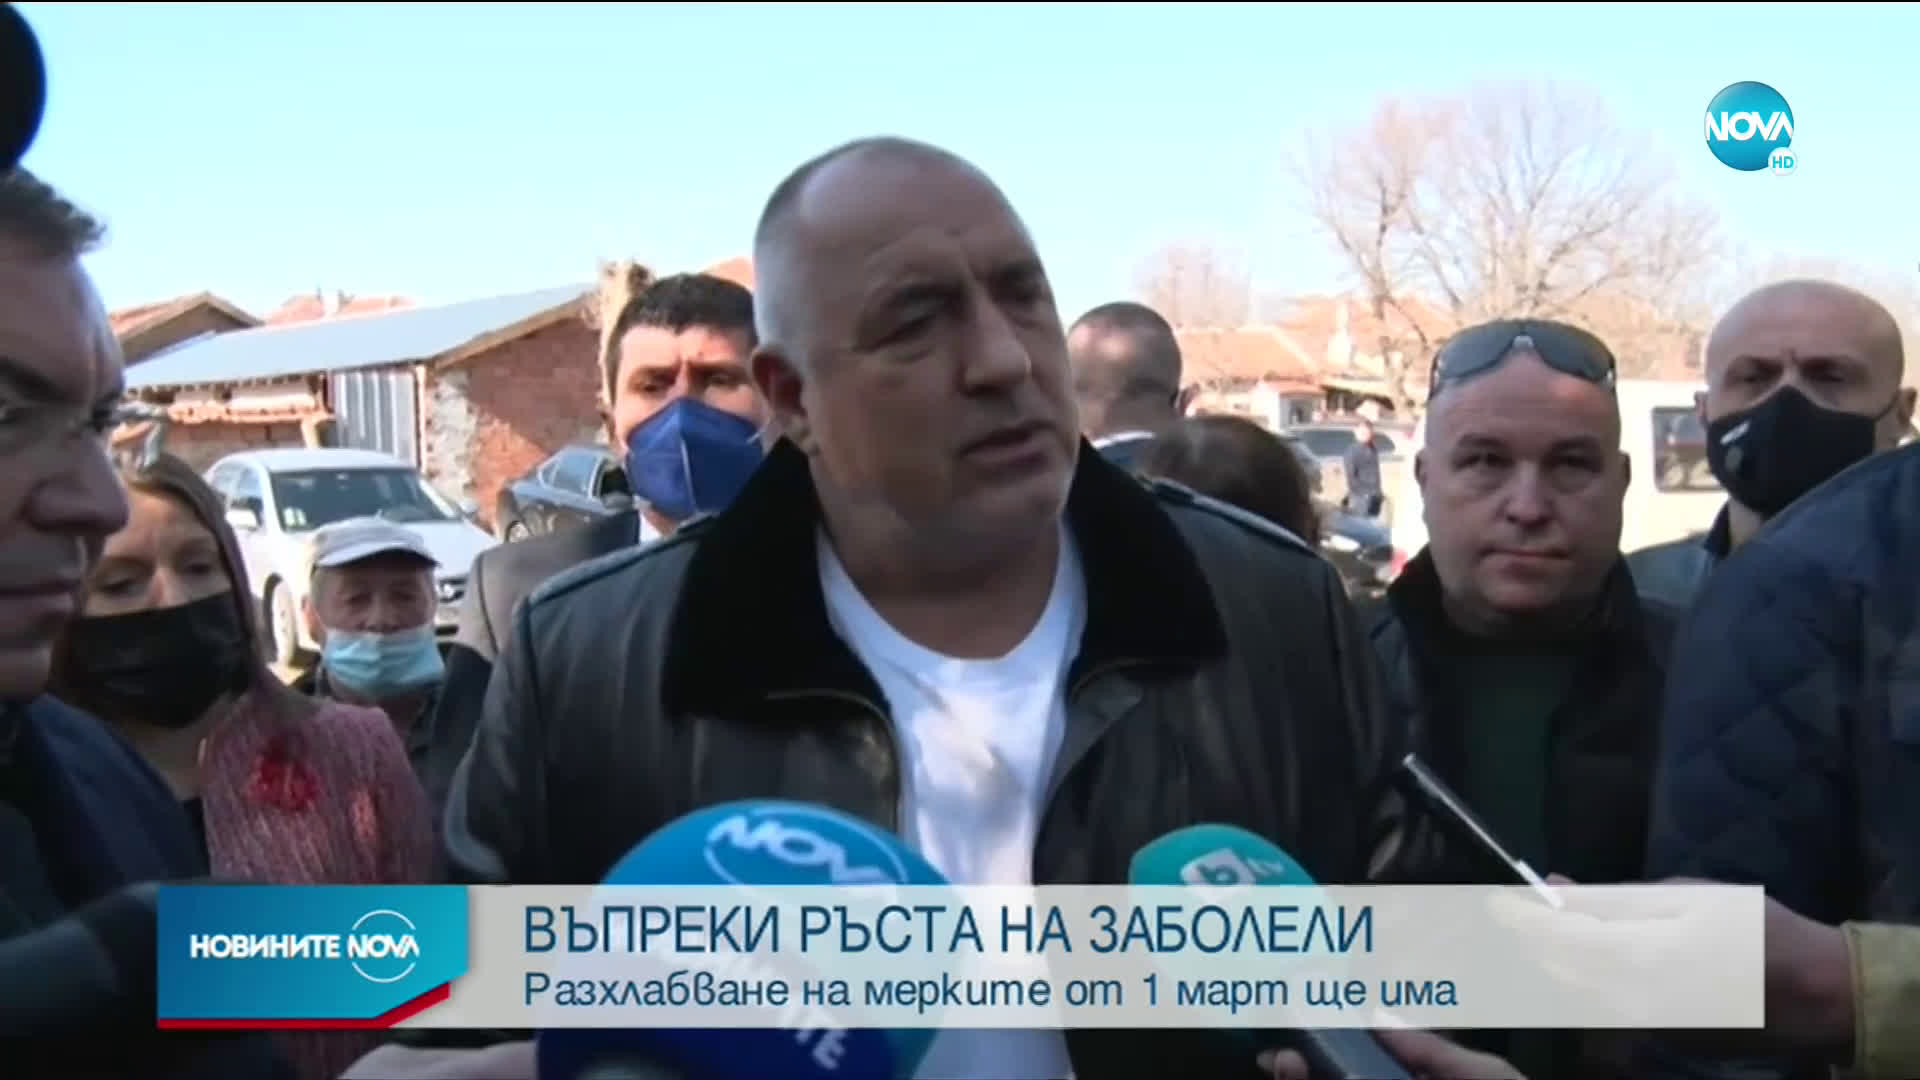 Борисов: Готови сме да изпратим самолет за още ваксини